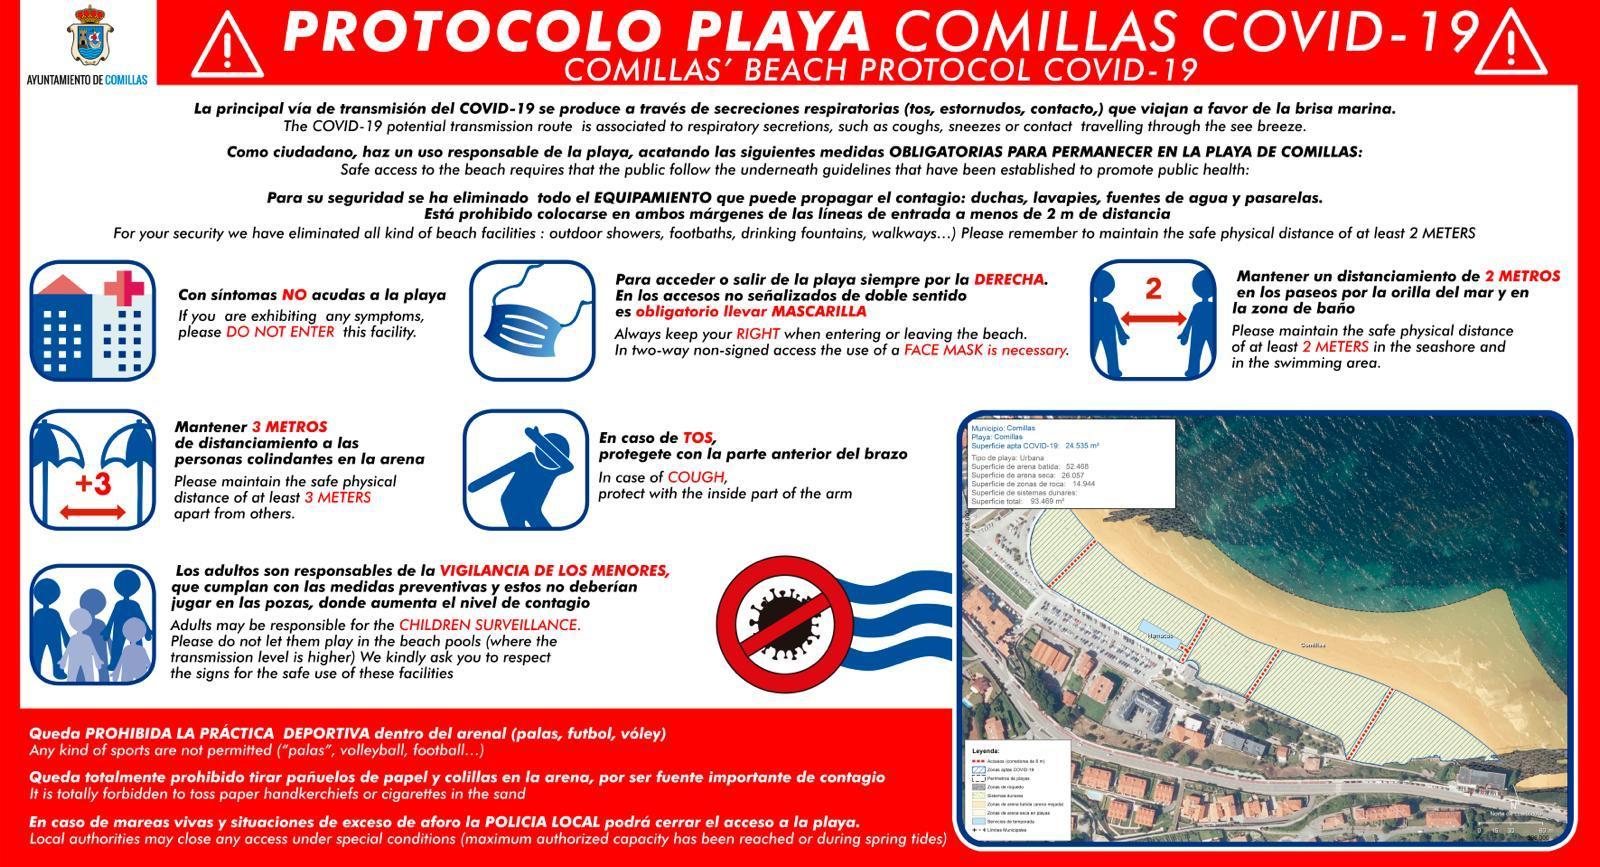 Protocolo COVID-19 playa 2020 - Comillas (Cantabria)